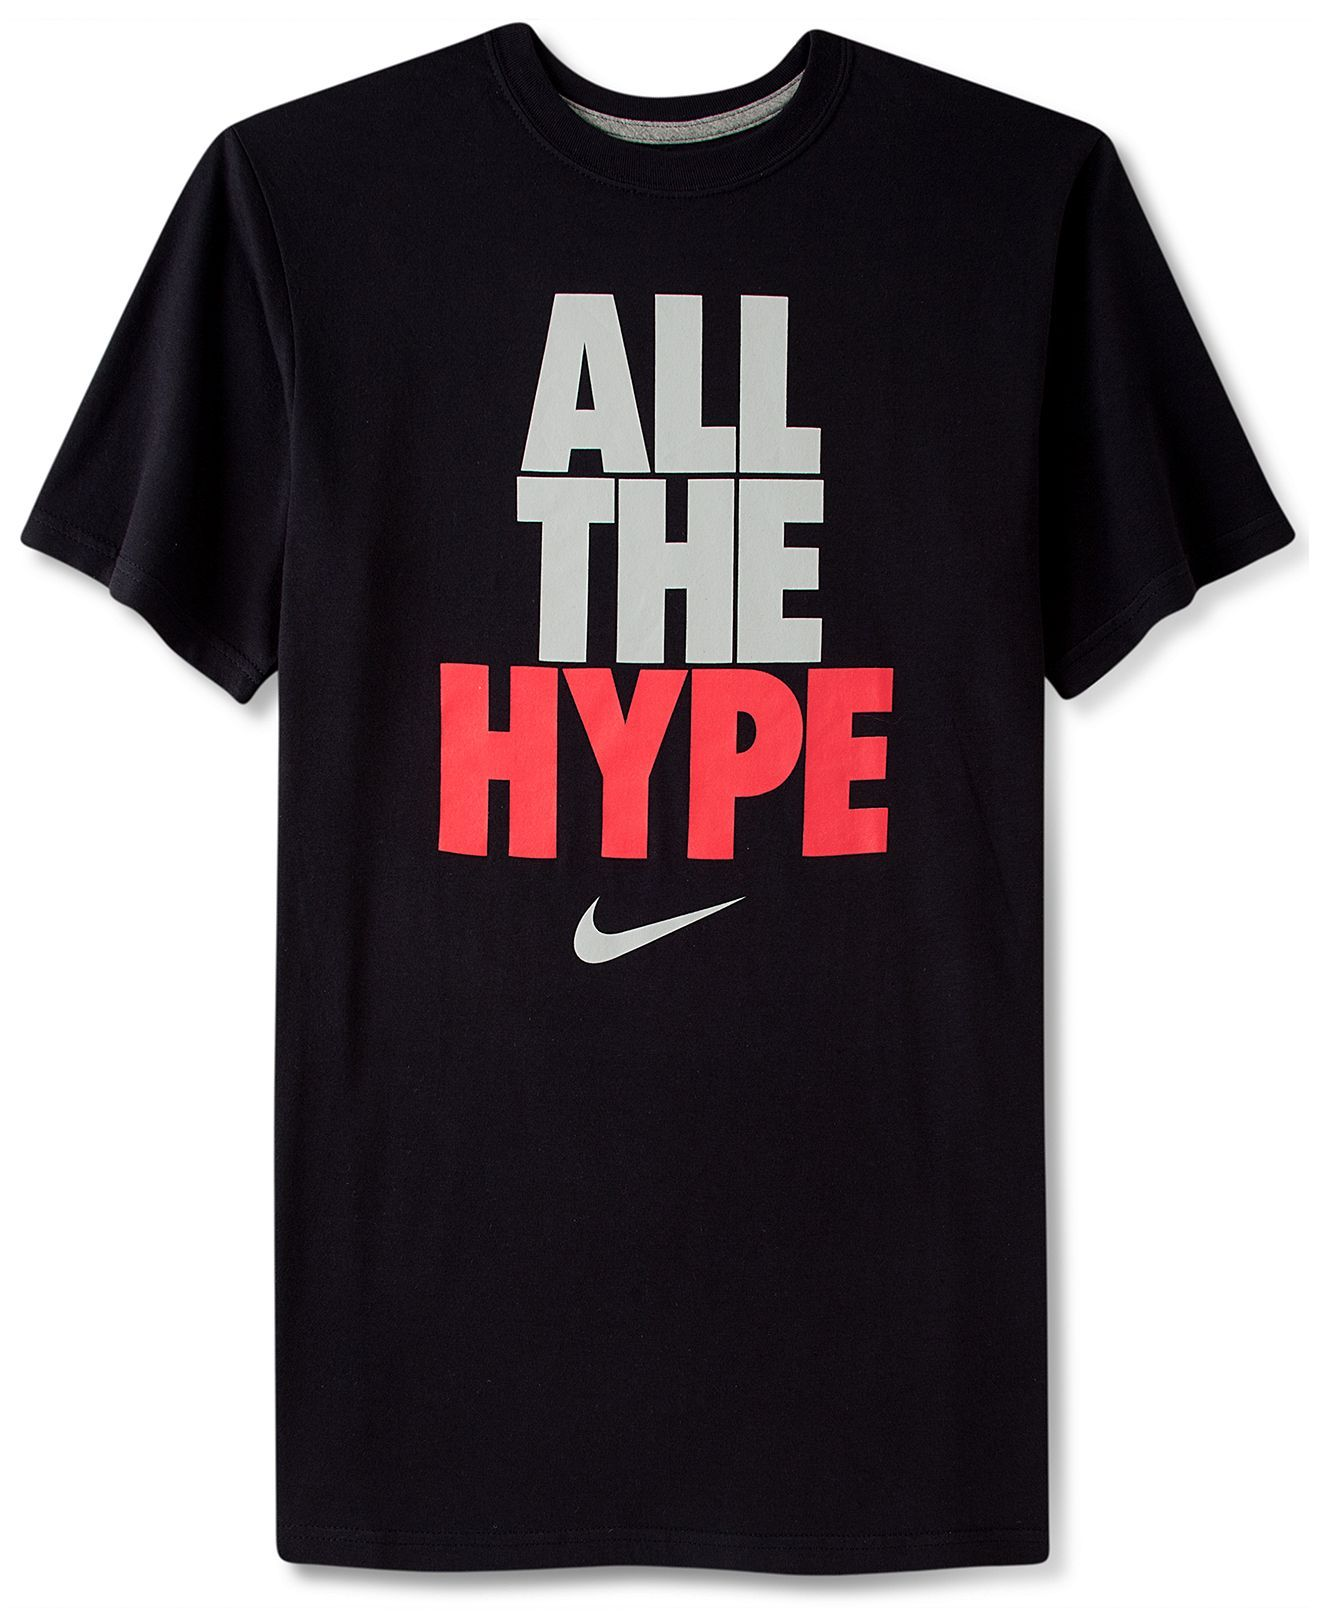 30e853f14403 Nike Shirt